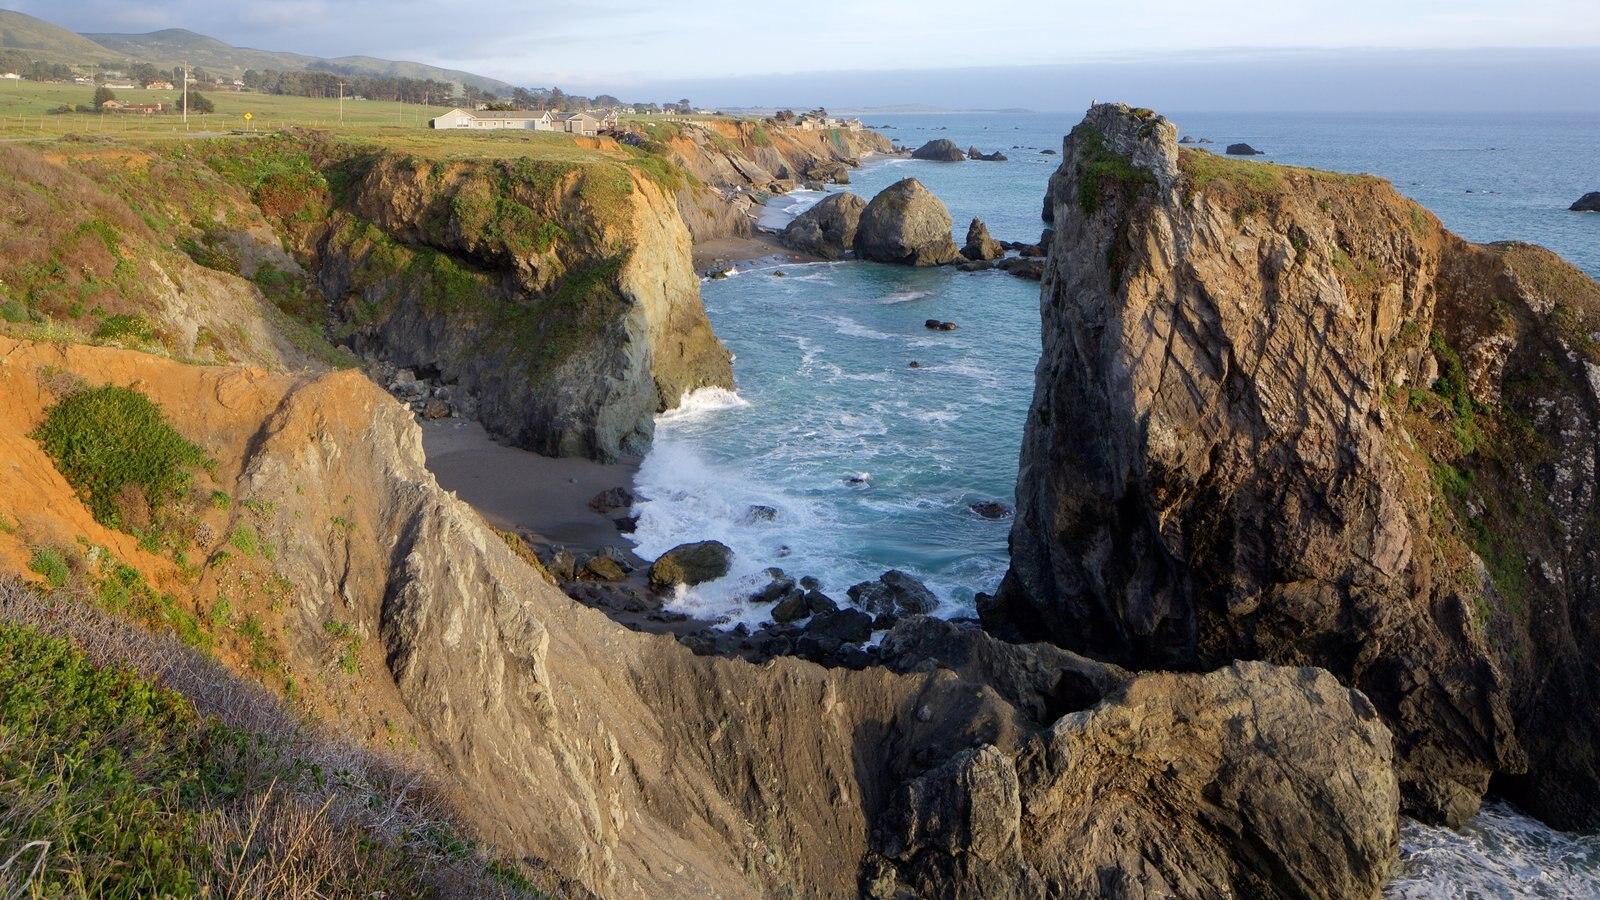 Sonoma Valley which includes general coastal views and rocky coastline